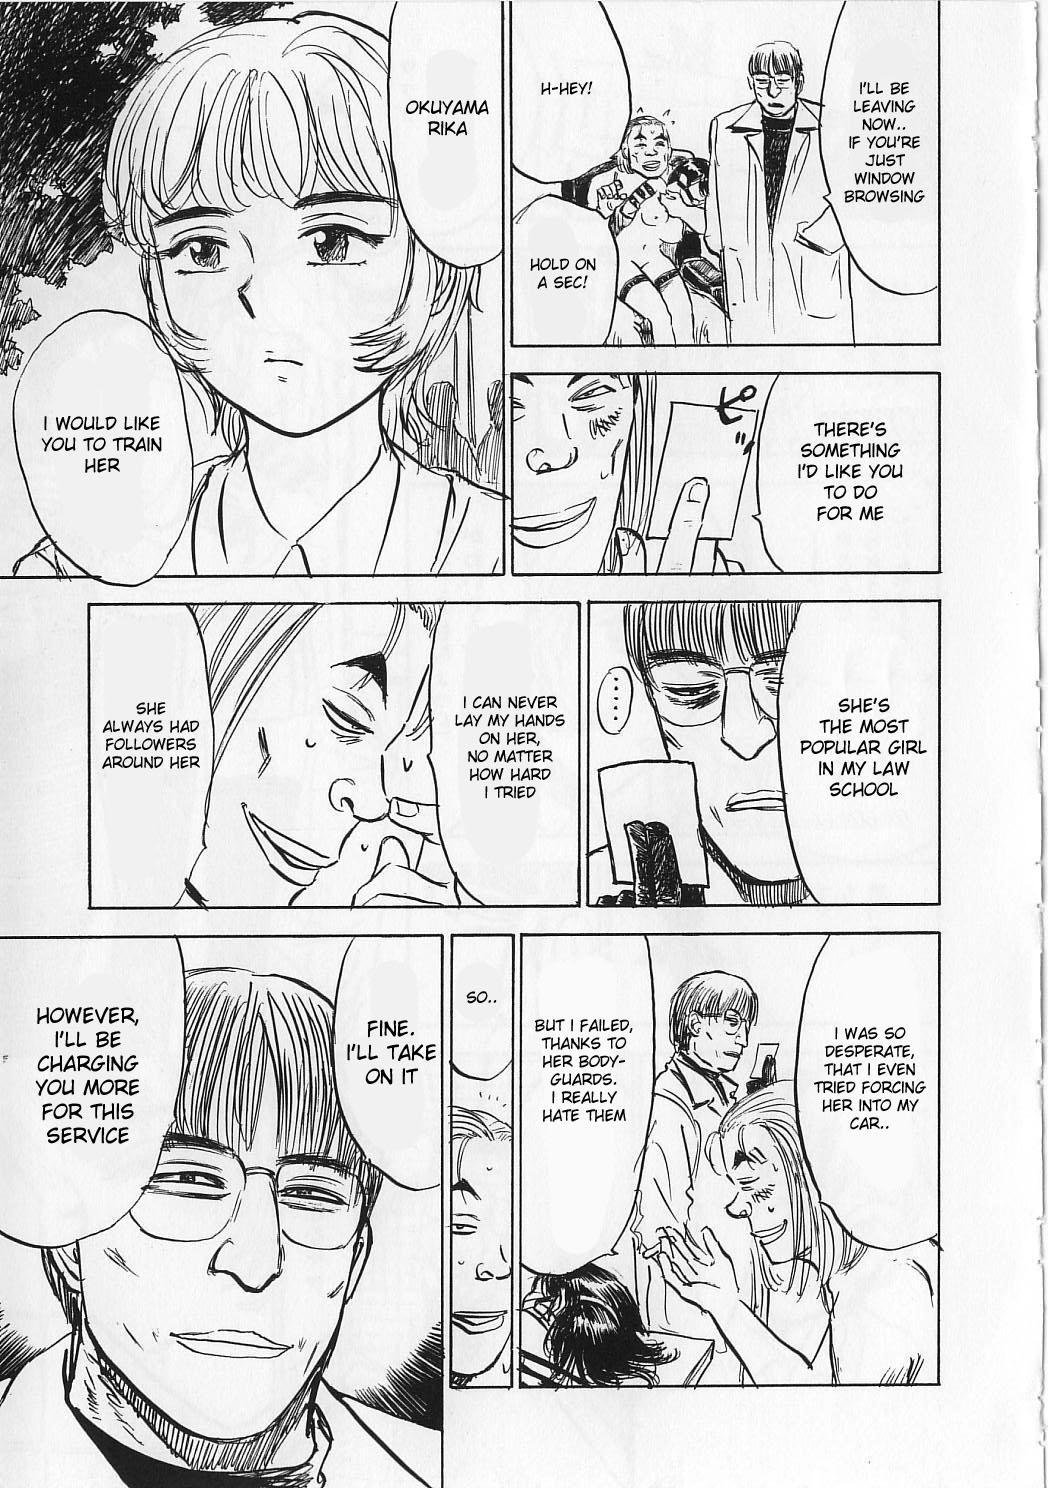 [Momoyama Jirou] Ningyou no Yakata - The Doll House Ch. 1-4 [English] 34